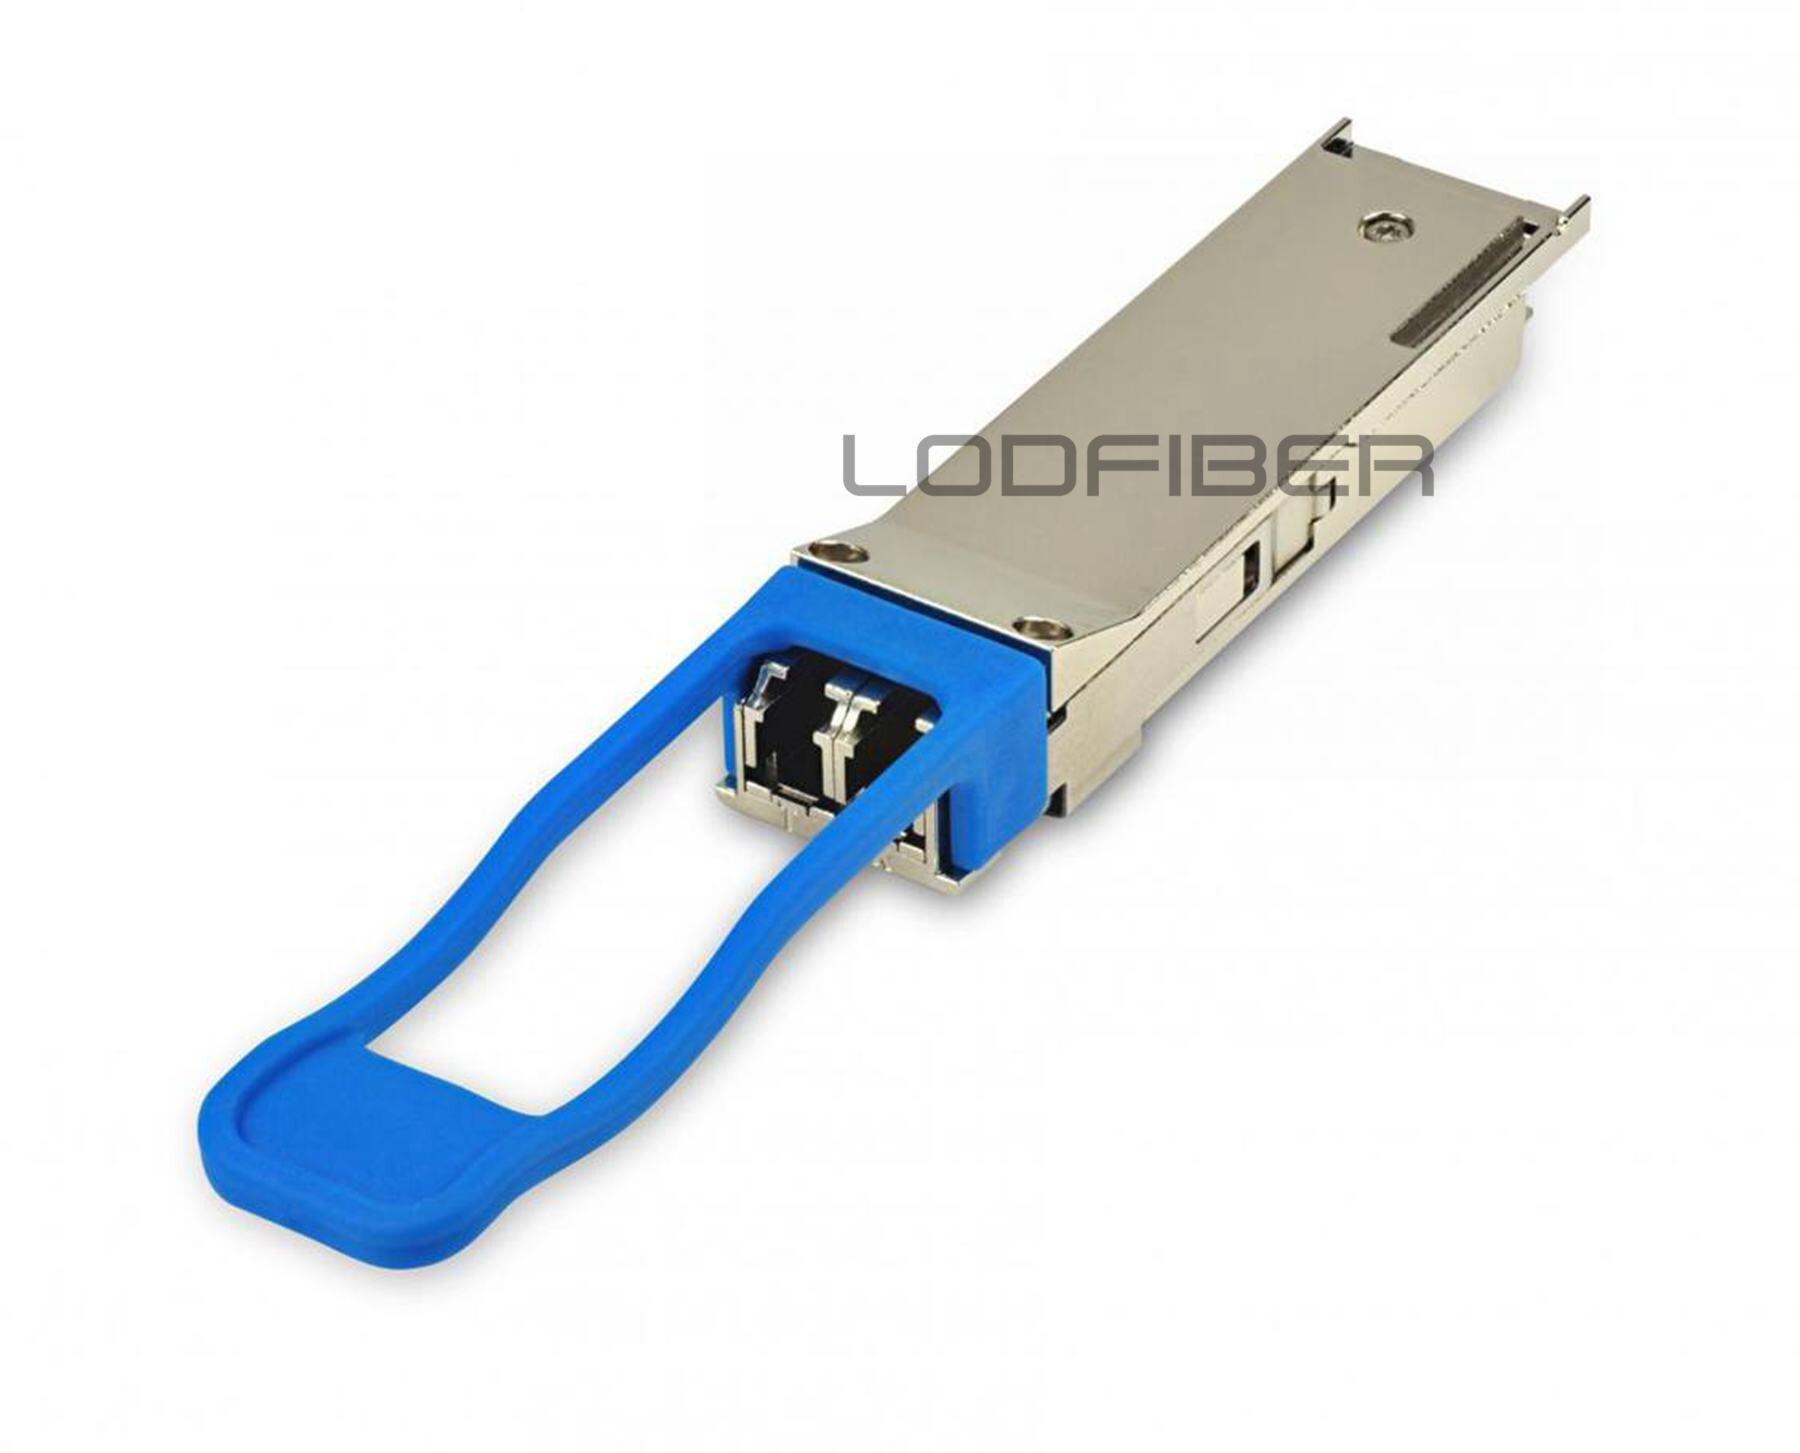 LODFIBER PAN-QSFP-40GBASE-LR4 Palo Alto redes Compatible 40GBASE-LR4 QSFP + 1310nm 10km LC transceptor